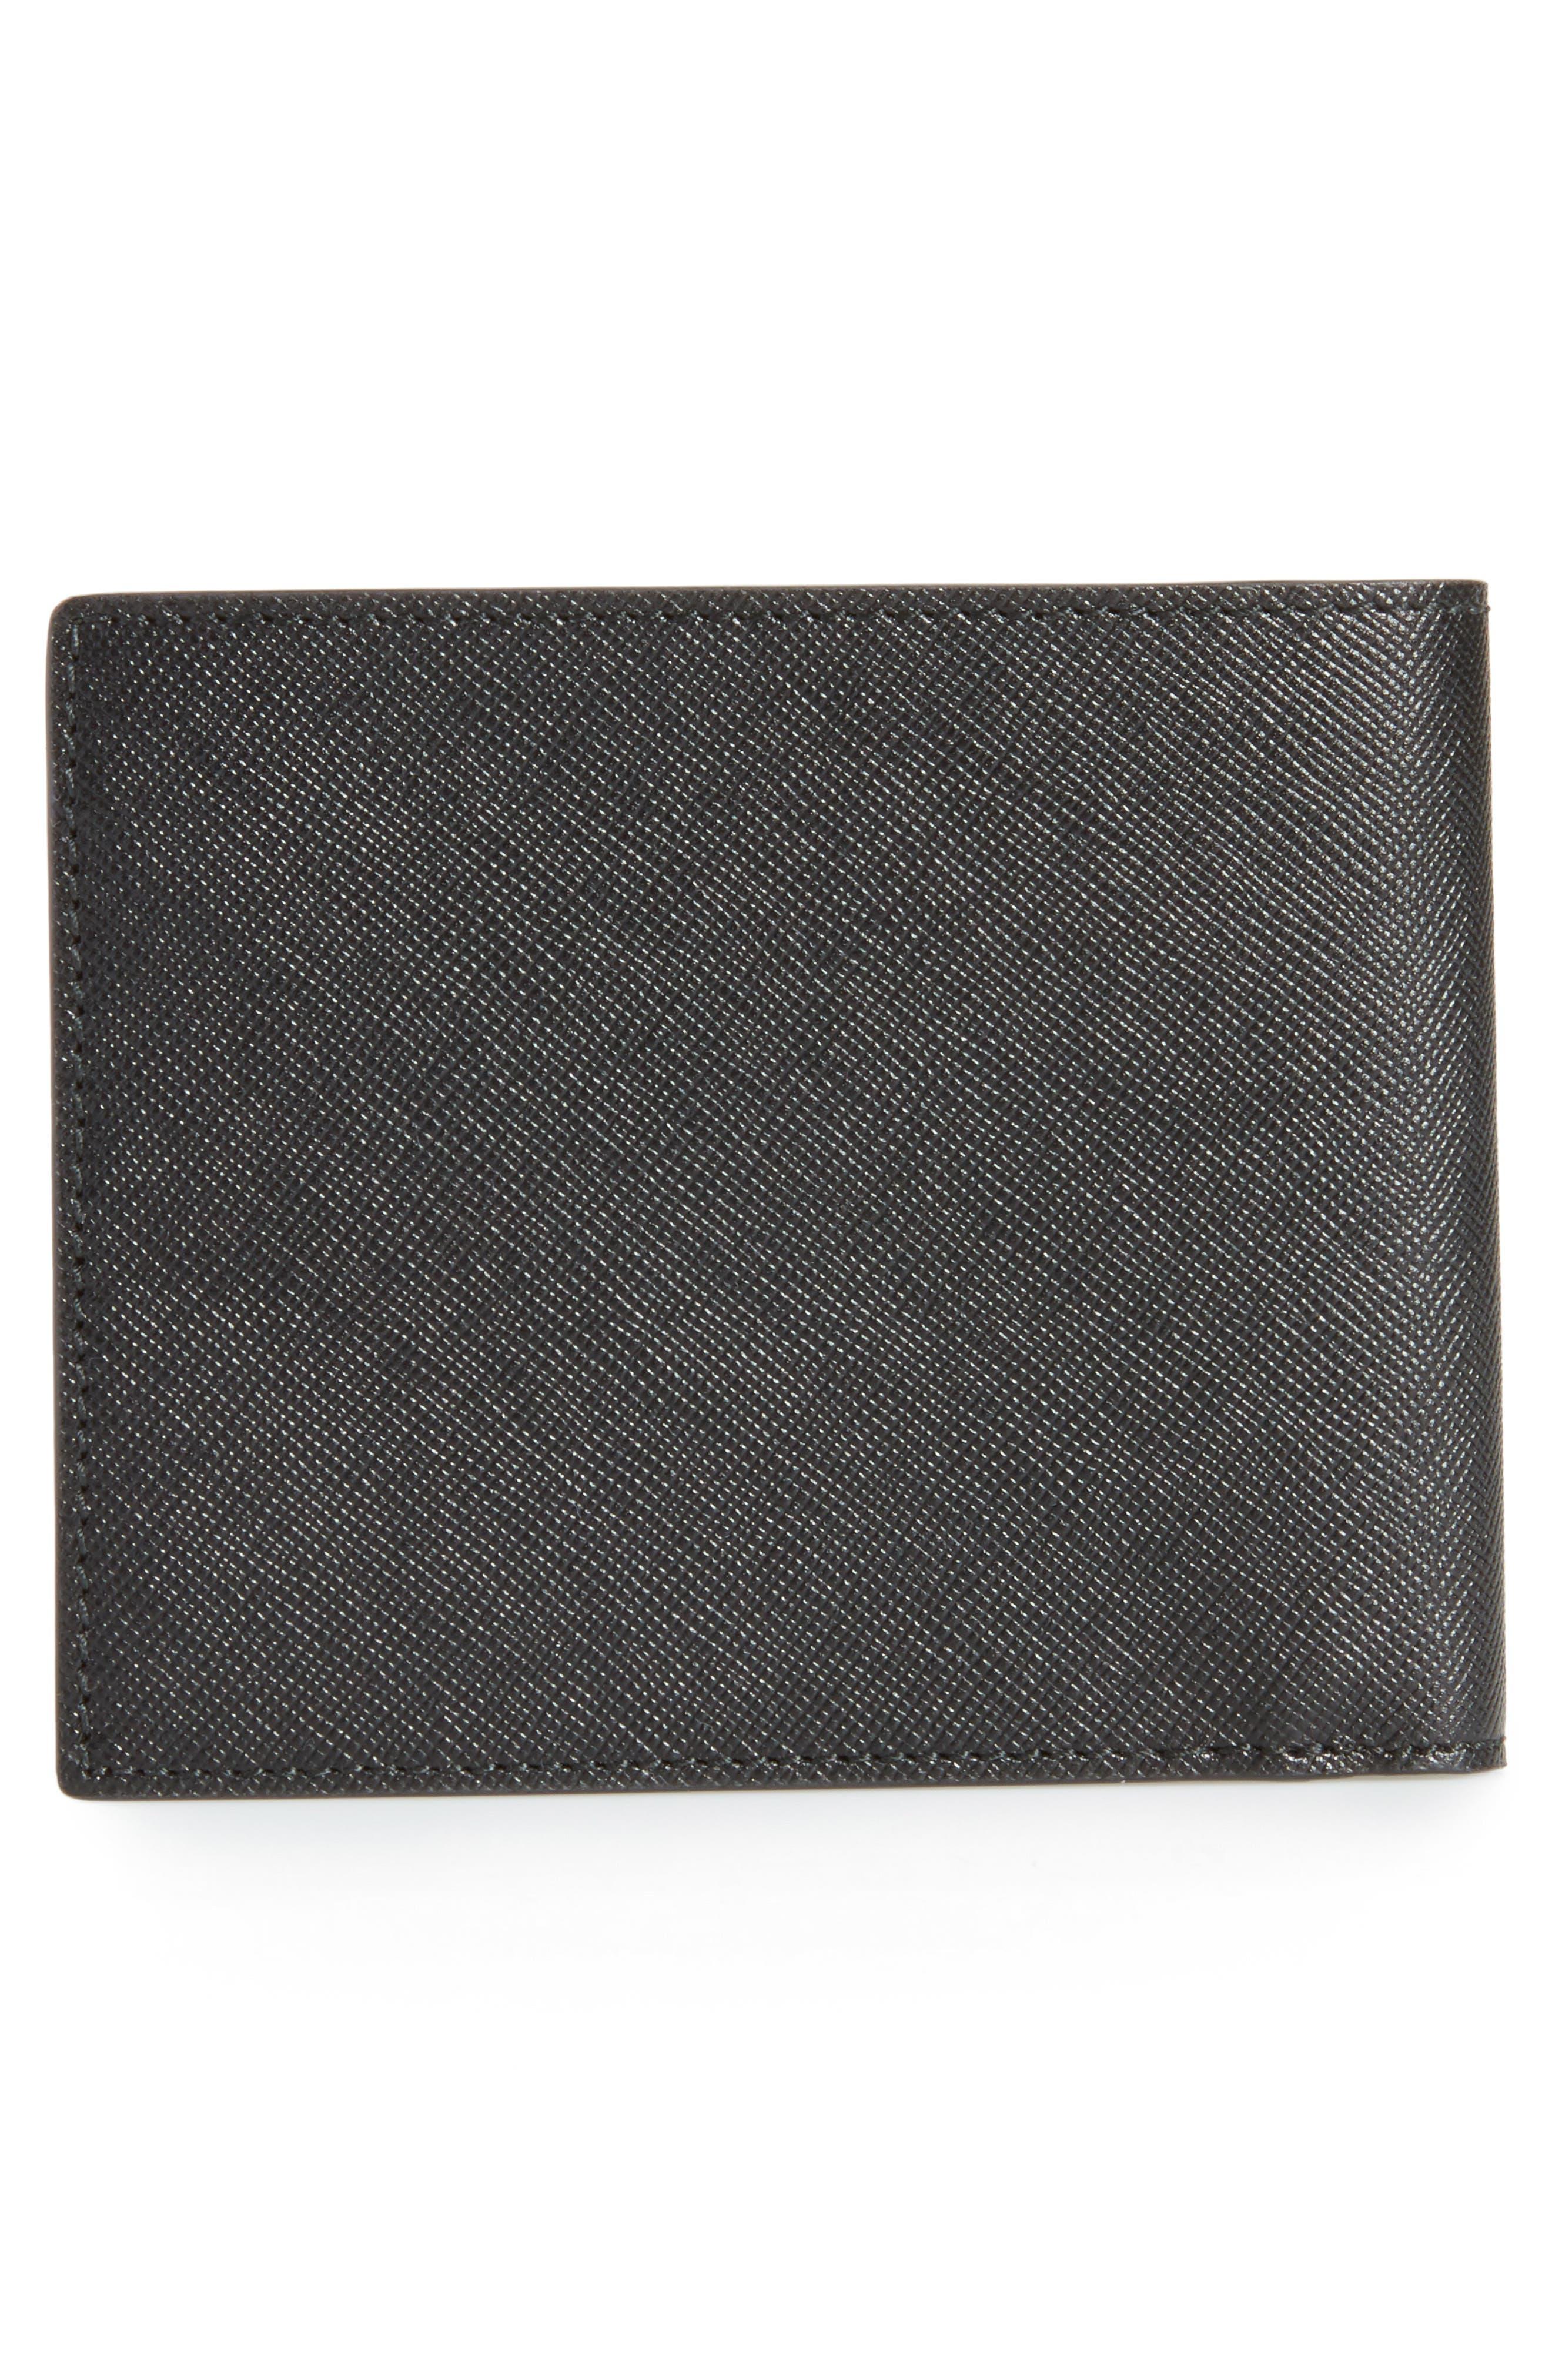 Alternate Image 3  - Montblanc Sartorial Leather Wallet